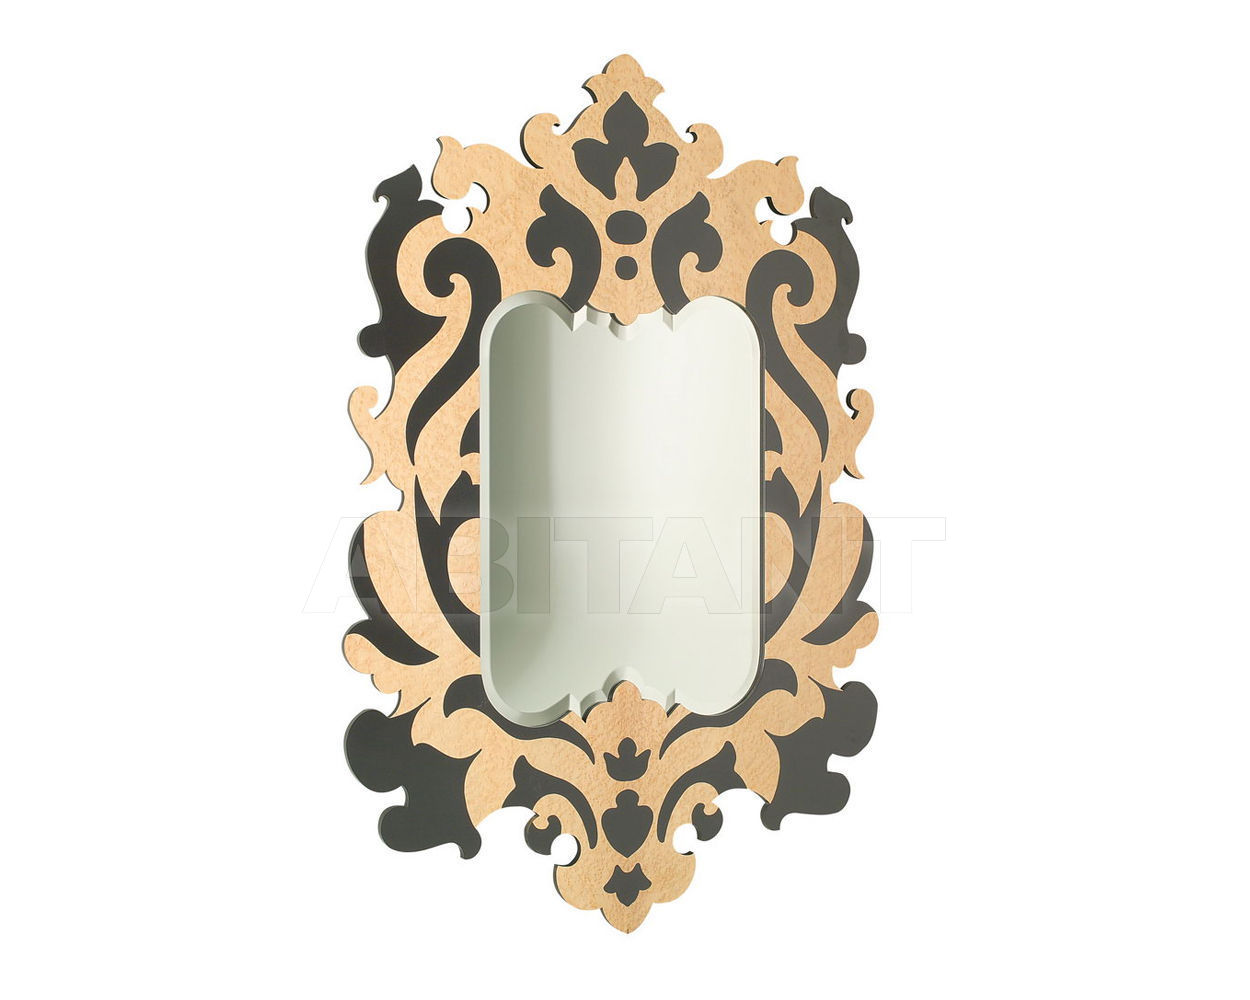 Купить Зеркало настенное Colombostile s.p.a. Tarsie 4216 SP-A